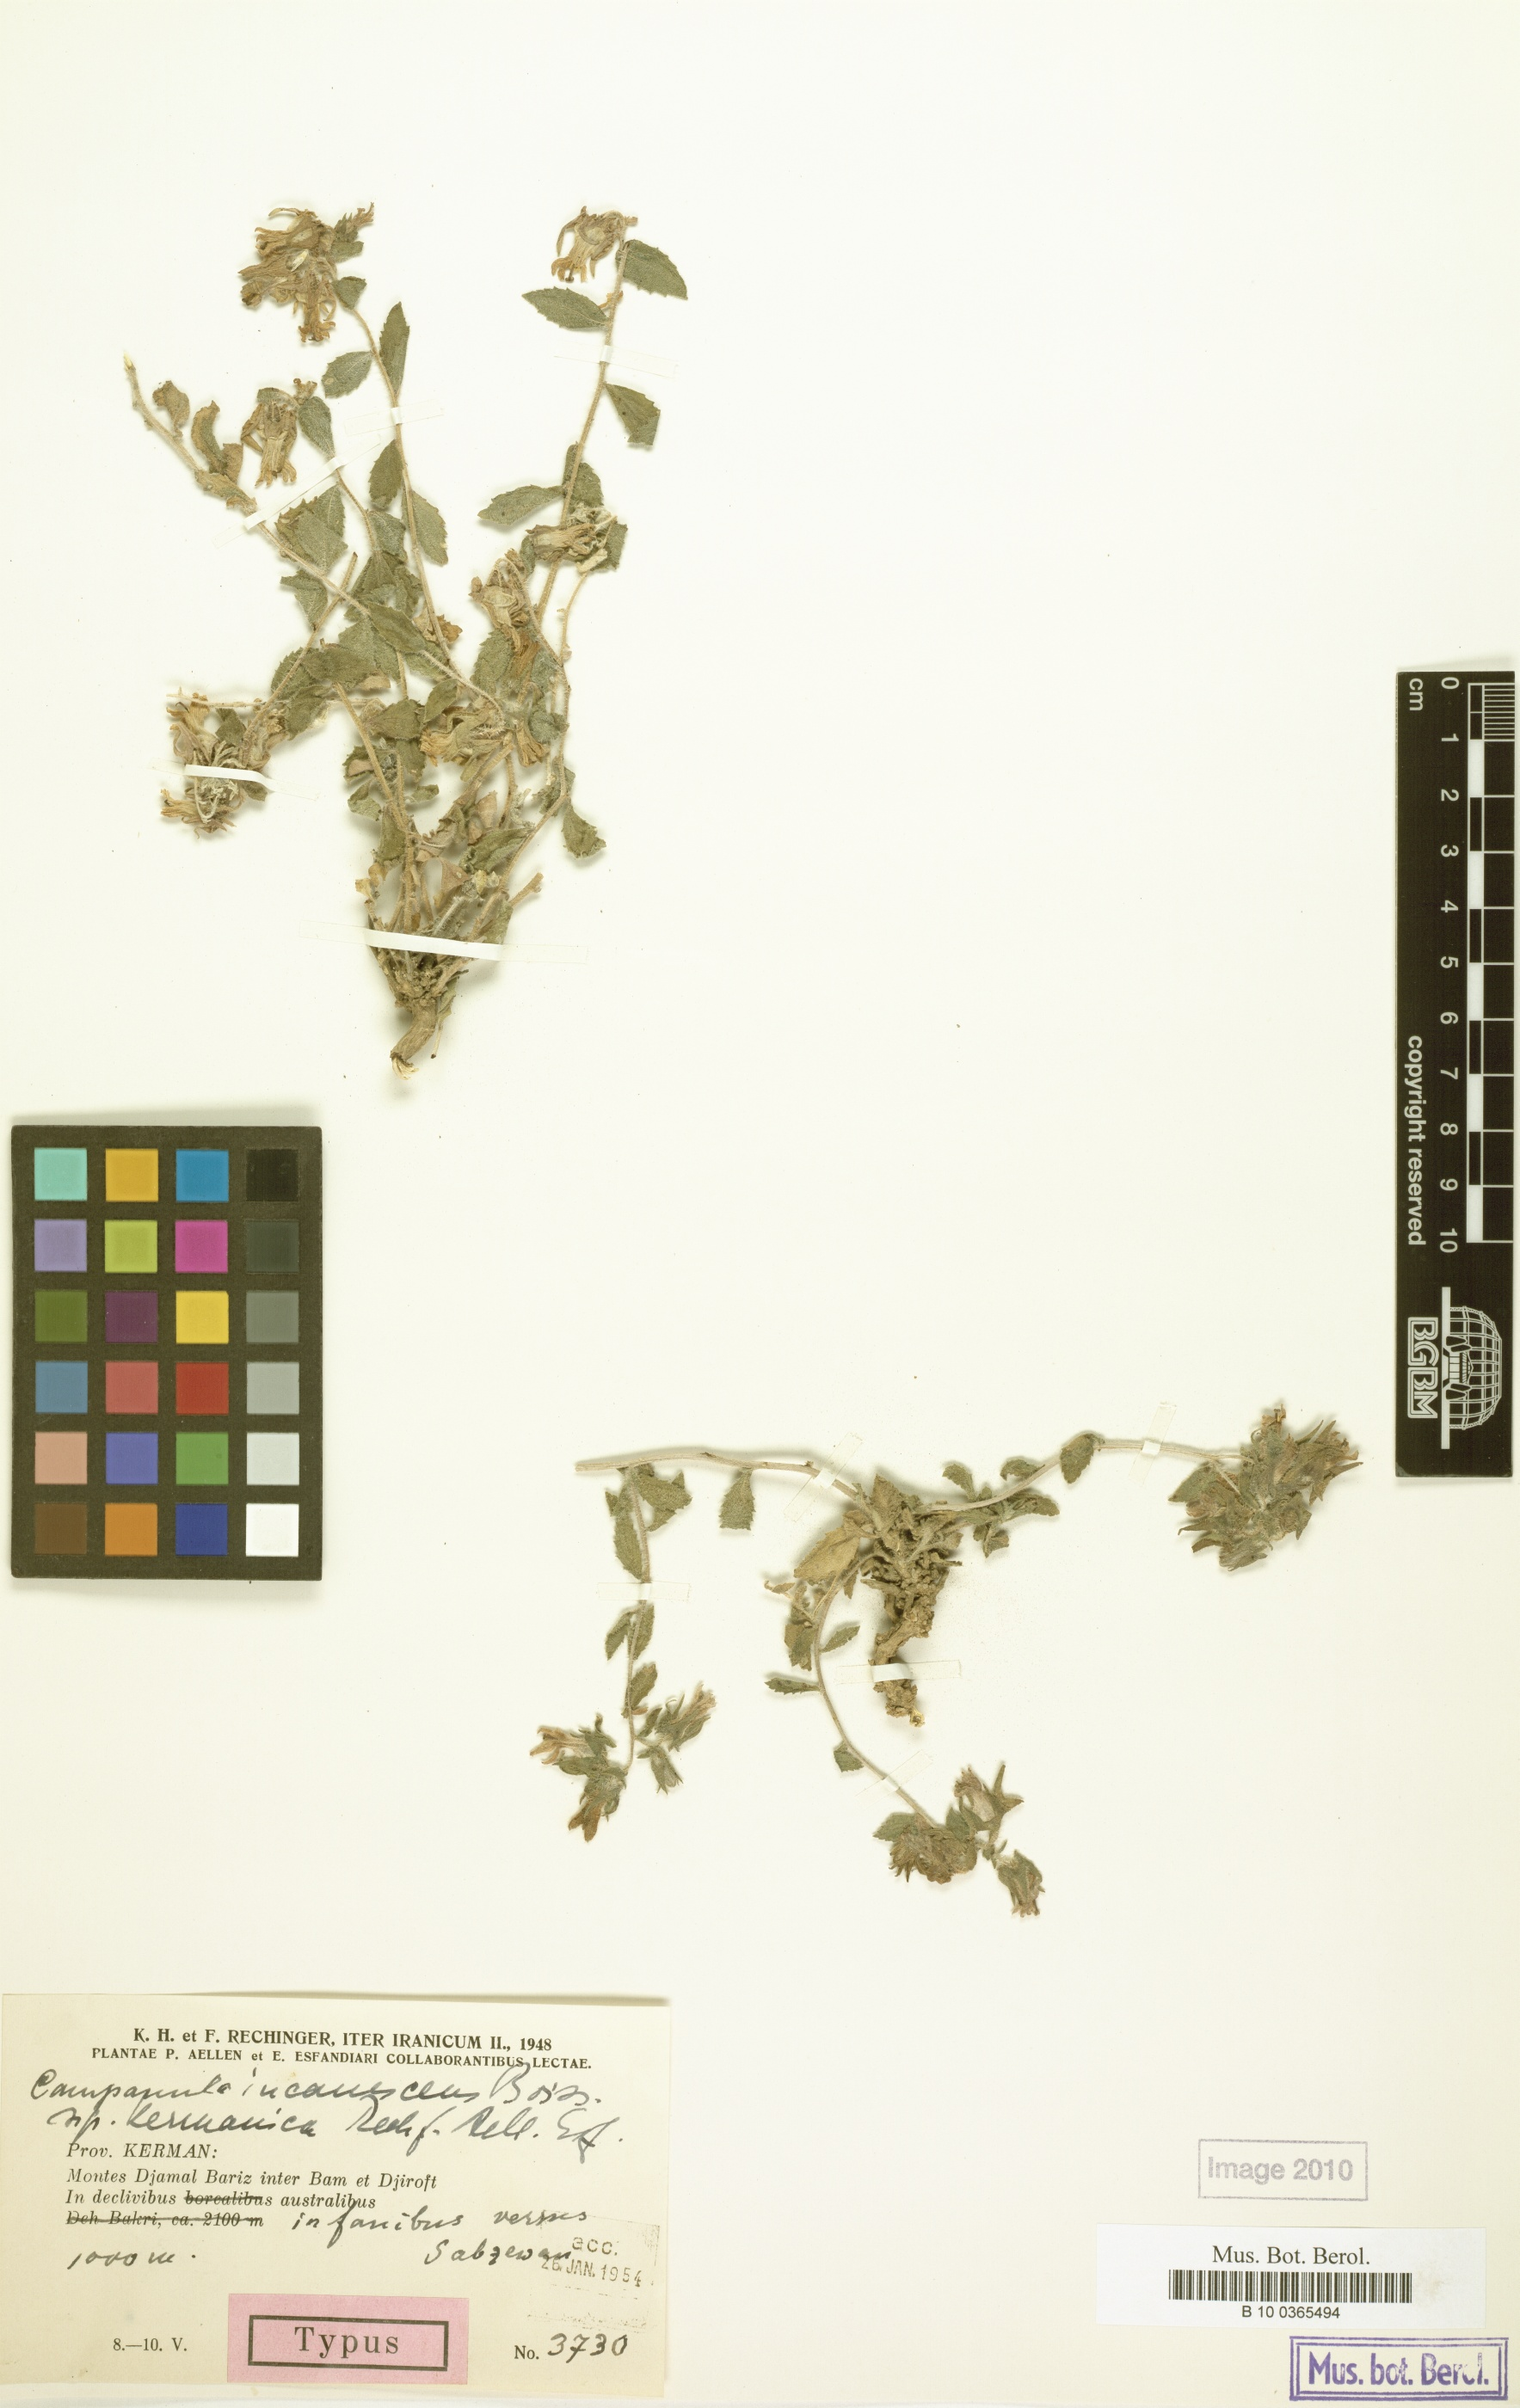 http://ww2.bgbm.org/herbarium/images/B/10/03/65/49/b_10_0365494.jpg